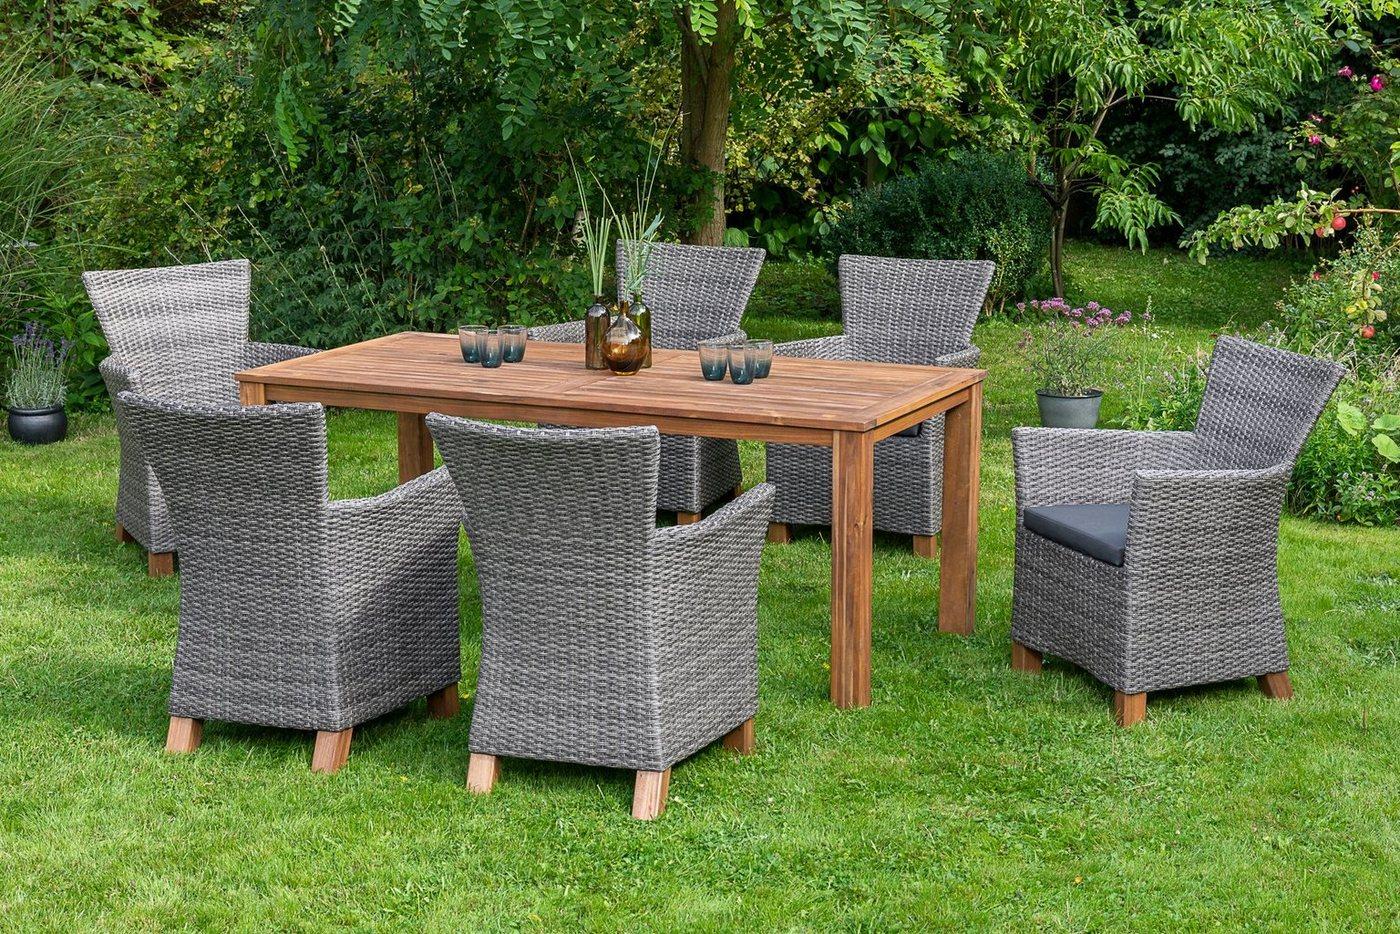 MERXX Diningset »Toskana«, 13-tlg., 6 Sessel, 1 Tisch 185x90 cm, Aluminium, Akazienholz